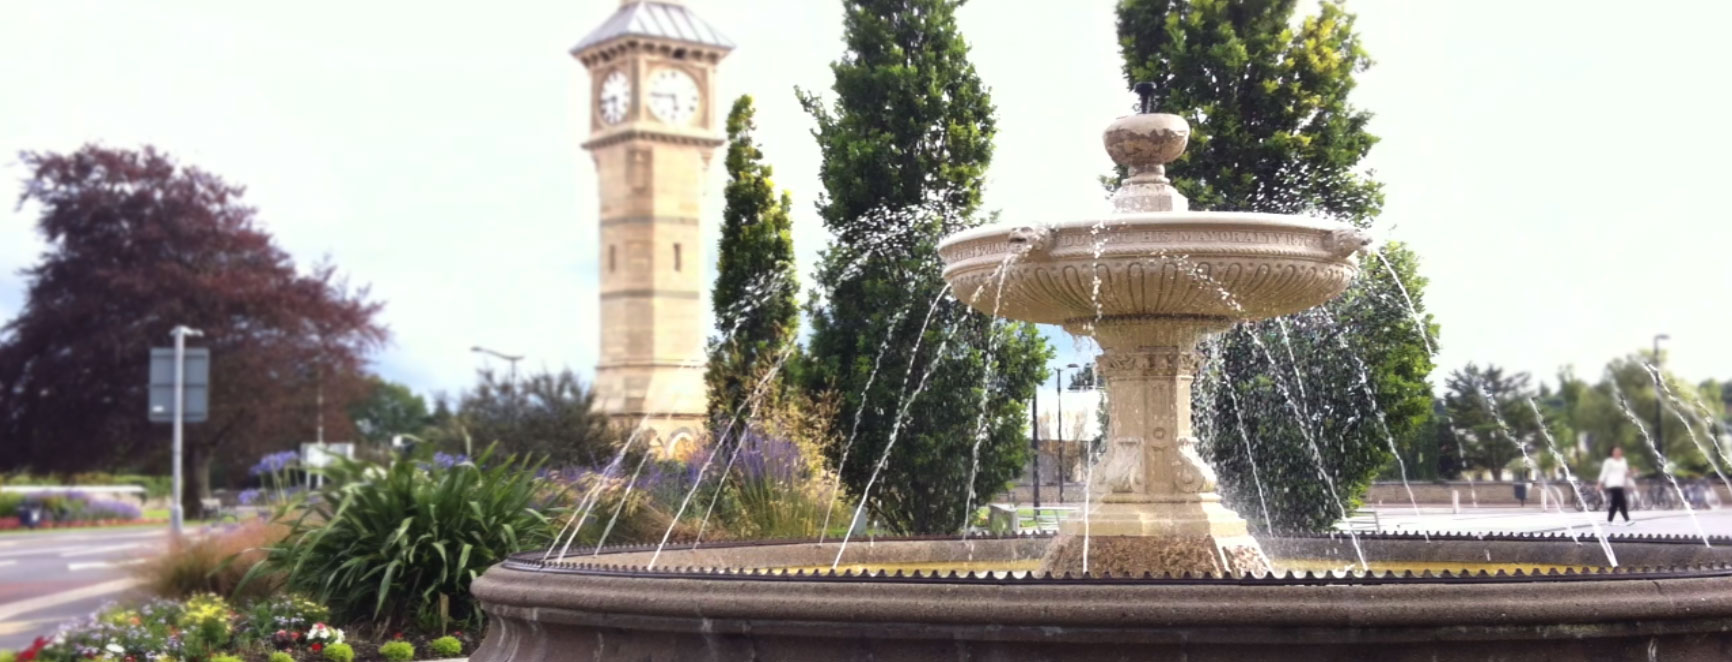 bnib-barnstaple-fountain